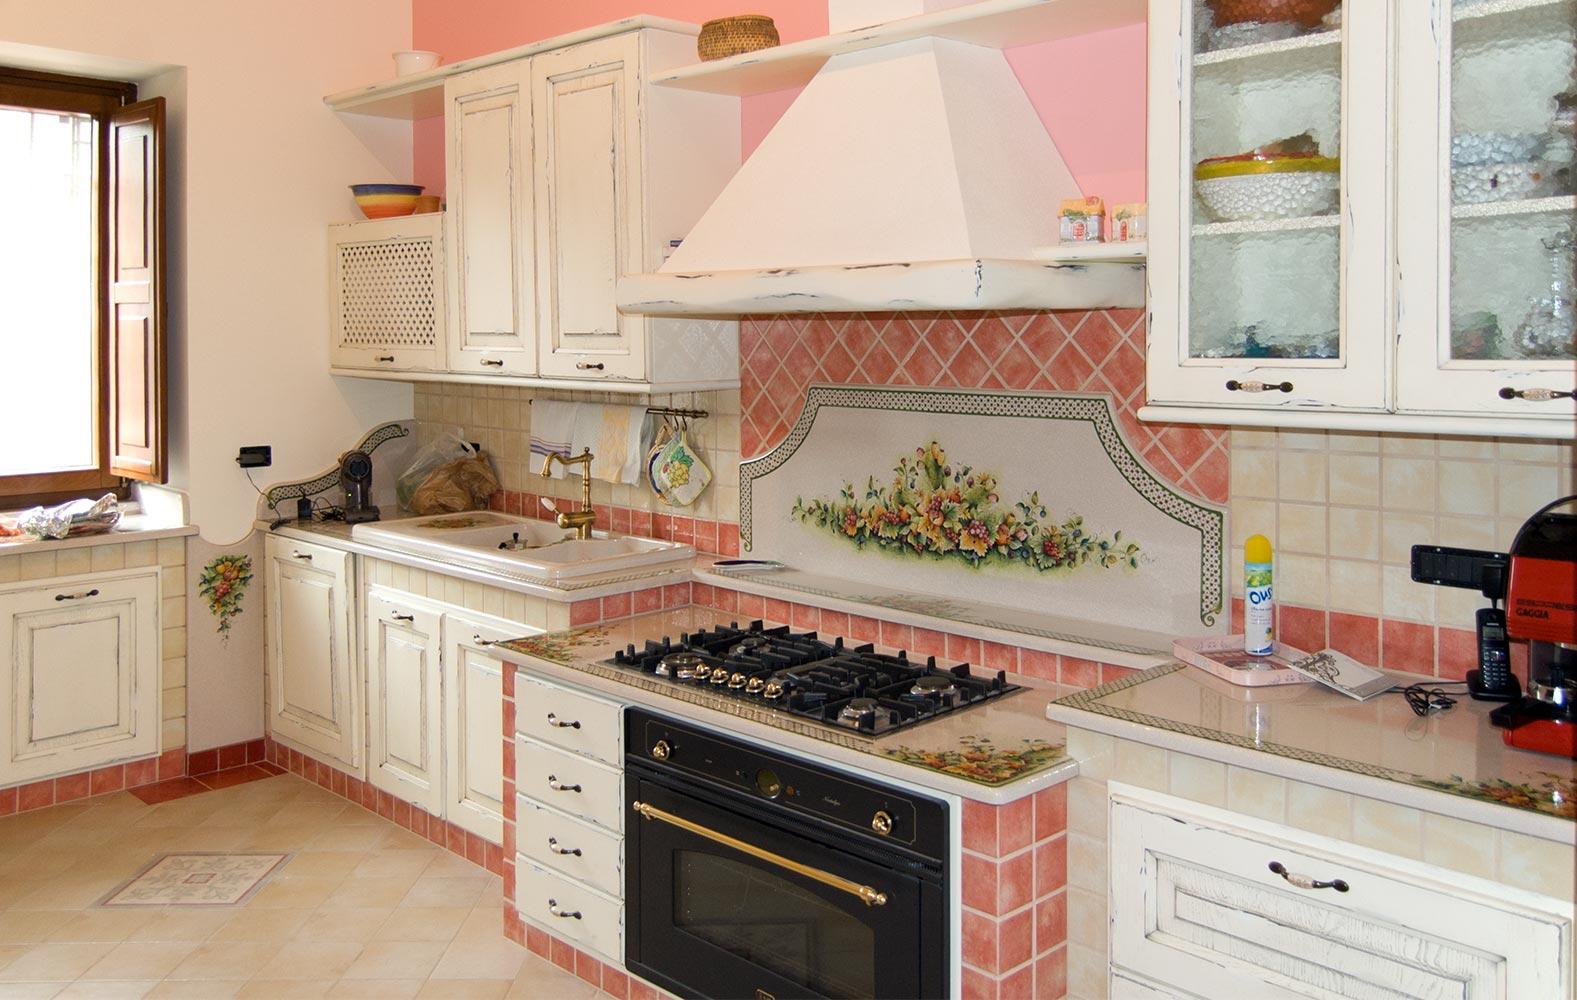 Cucina In Finta Muratura Bianca.Le Cucine Rustiche D Altri Tempi Realizzate Su Misura